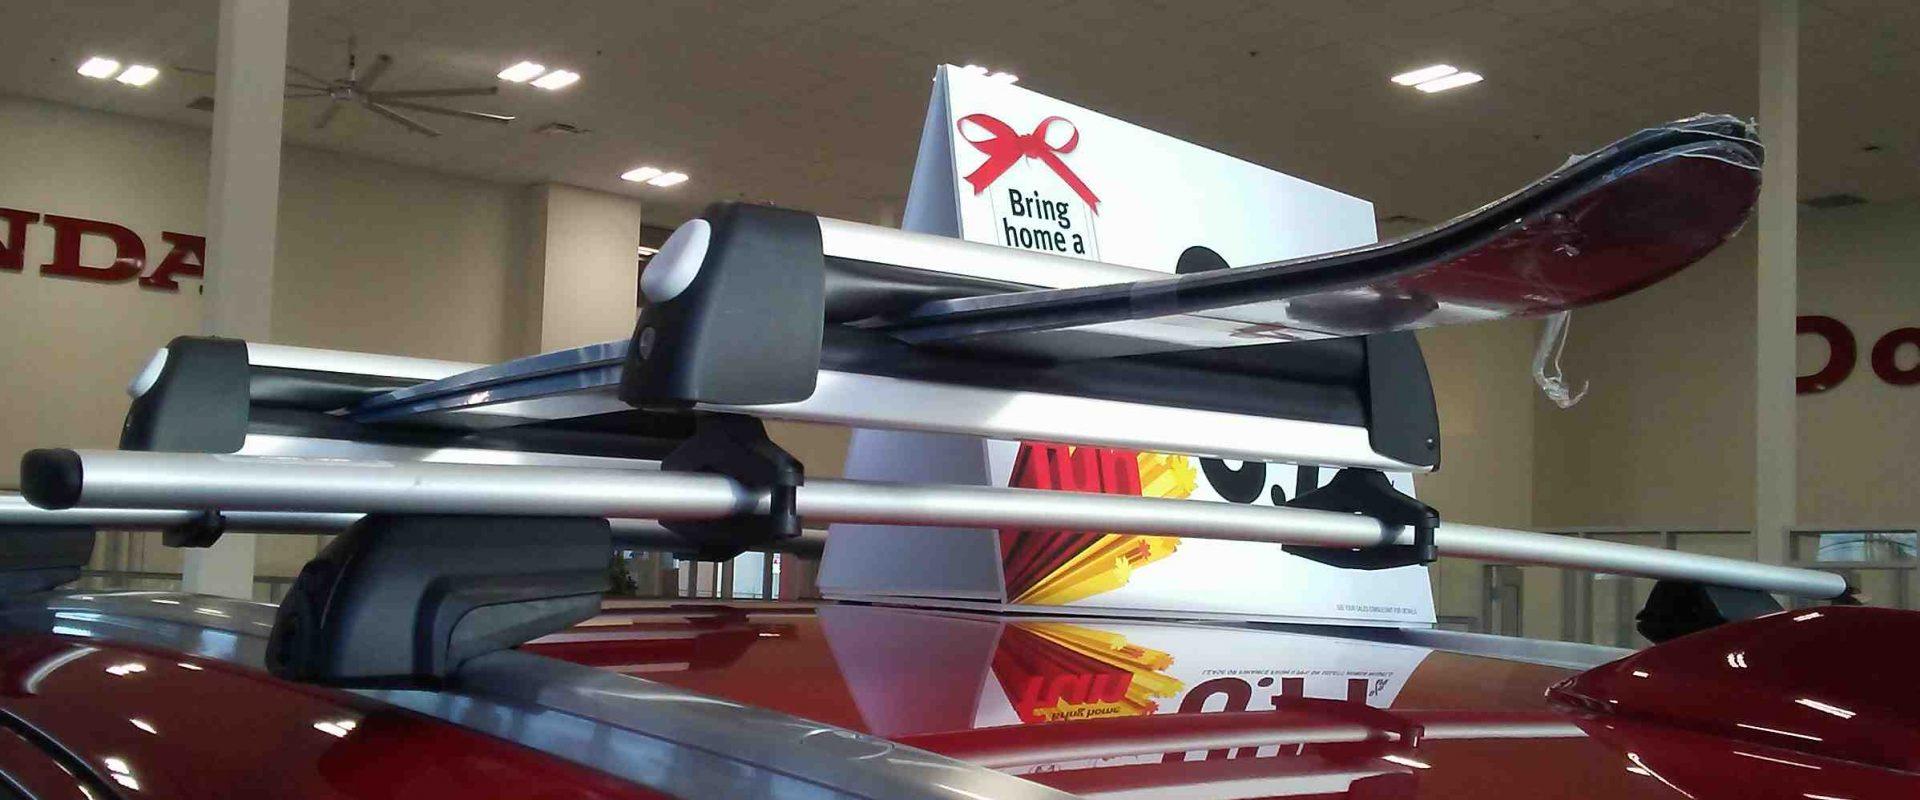 Honda ski rack accessory